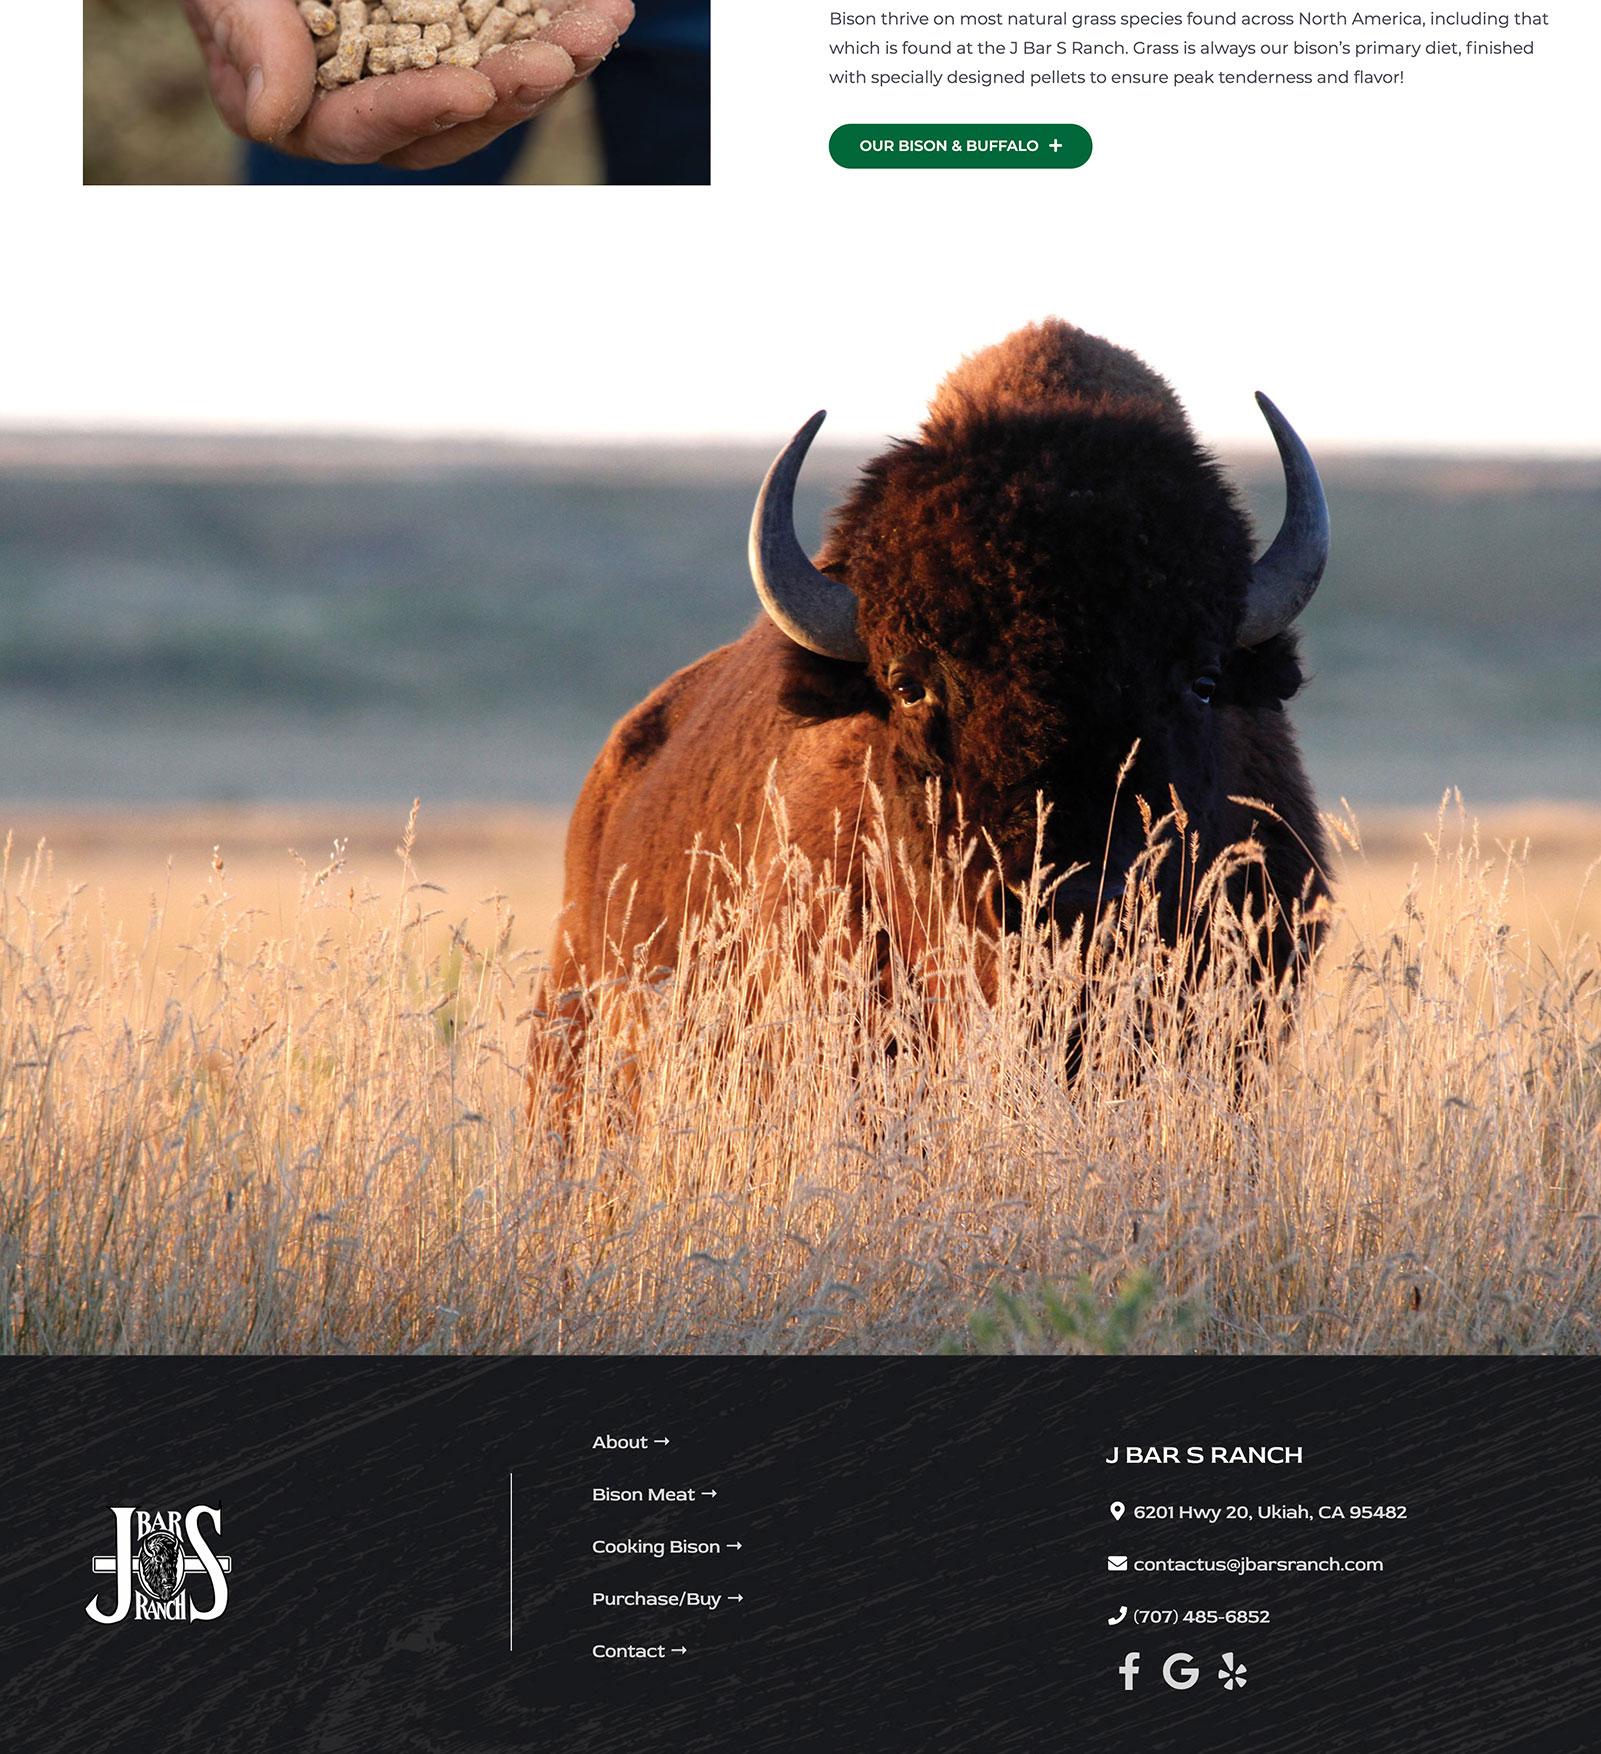 J Bar S Ranch Website